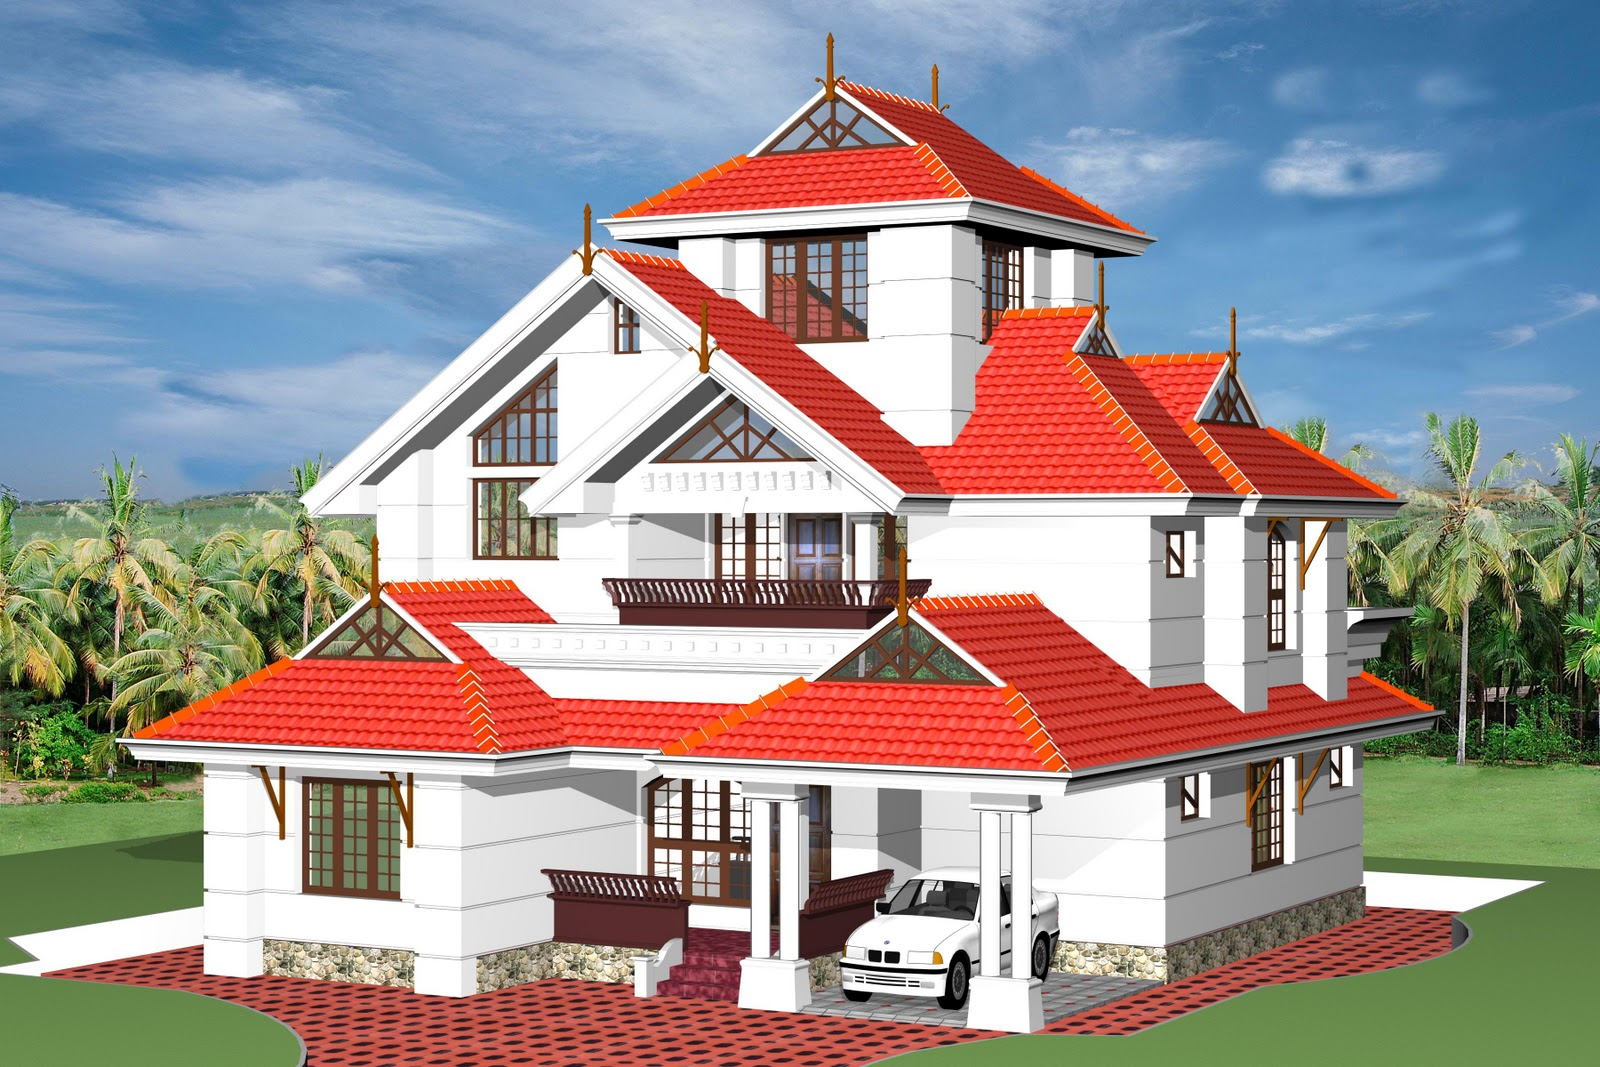 http://3.bp.blogspot.com/_q1j0hR8hy58/TRH33AFl5-I/AAAAAAAABe4/QXKw82cPA4A/s1600/Fresh+3D+views+of+Kerala+Style+Home+Plans.jpg